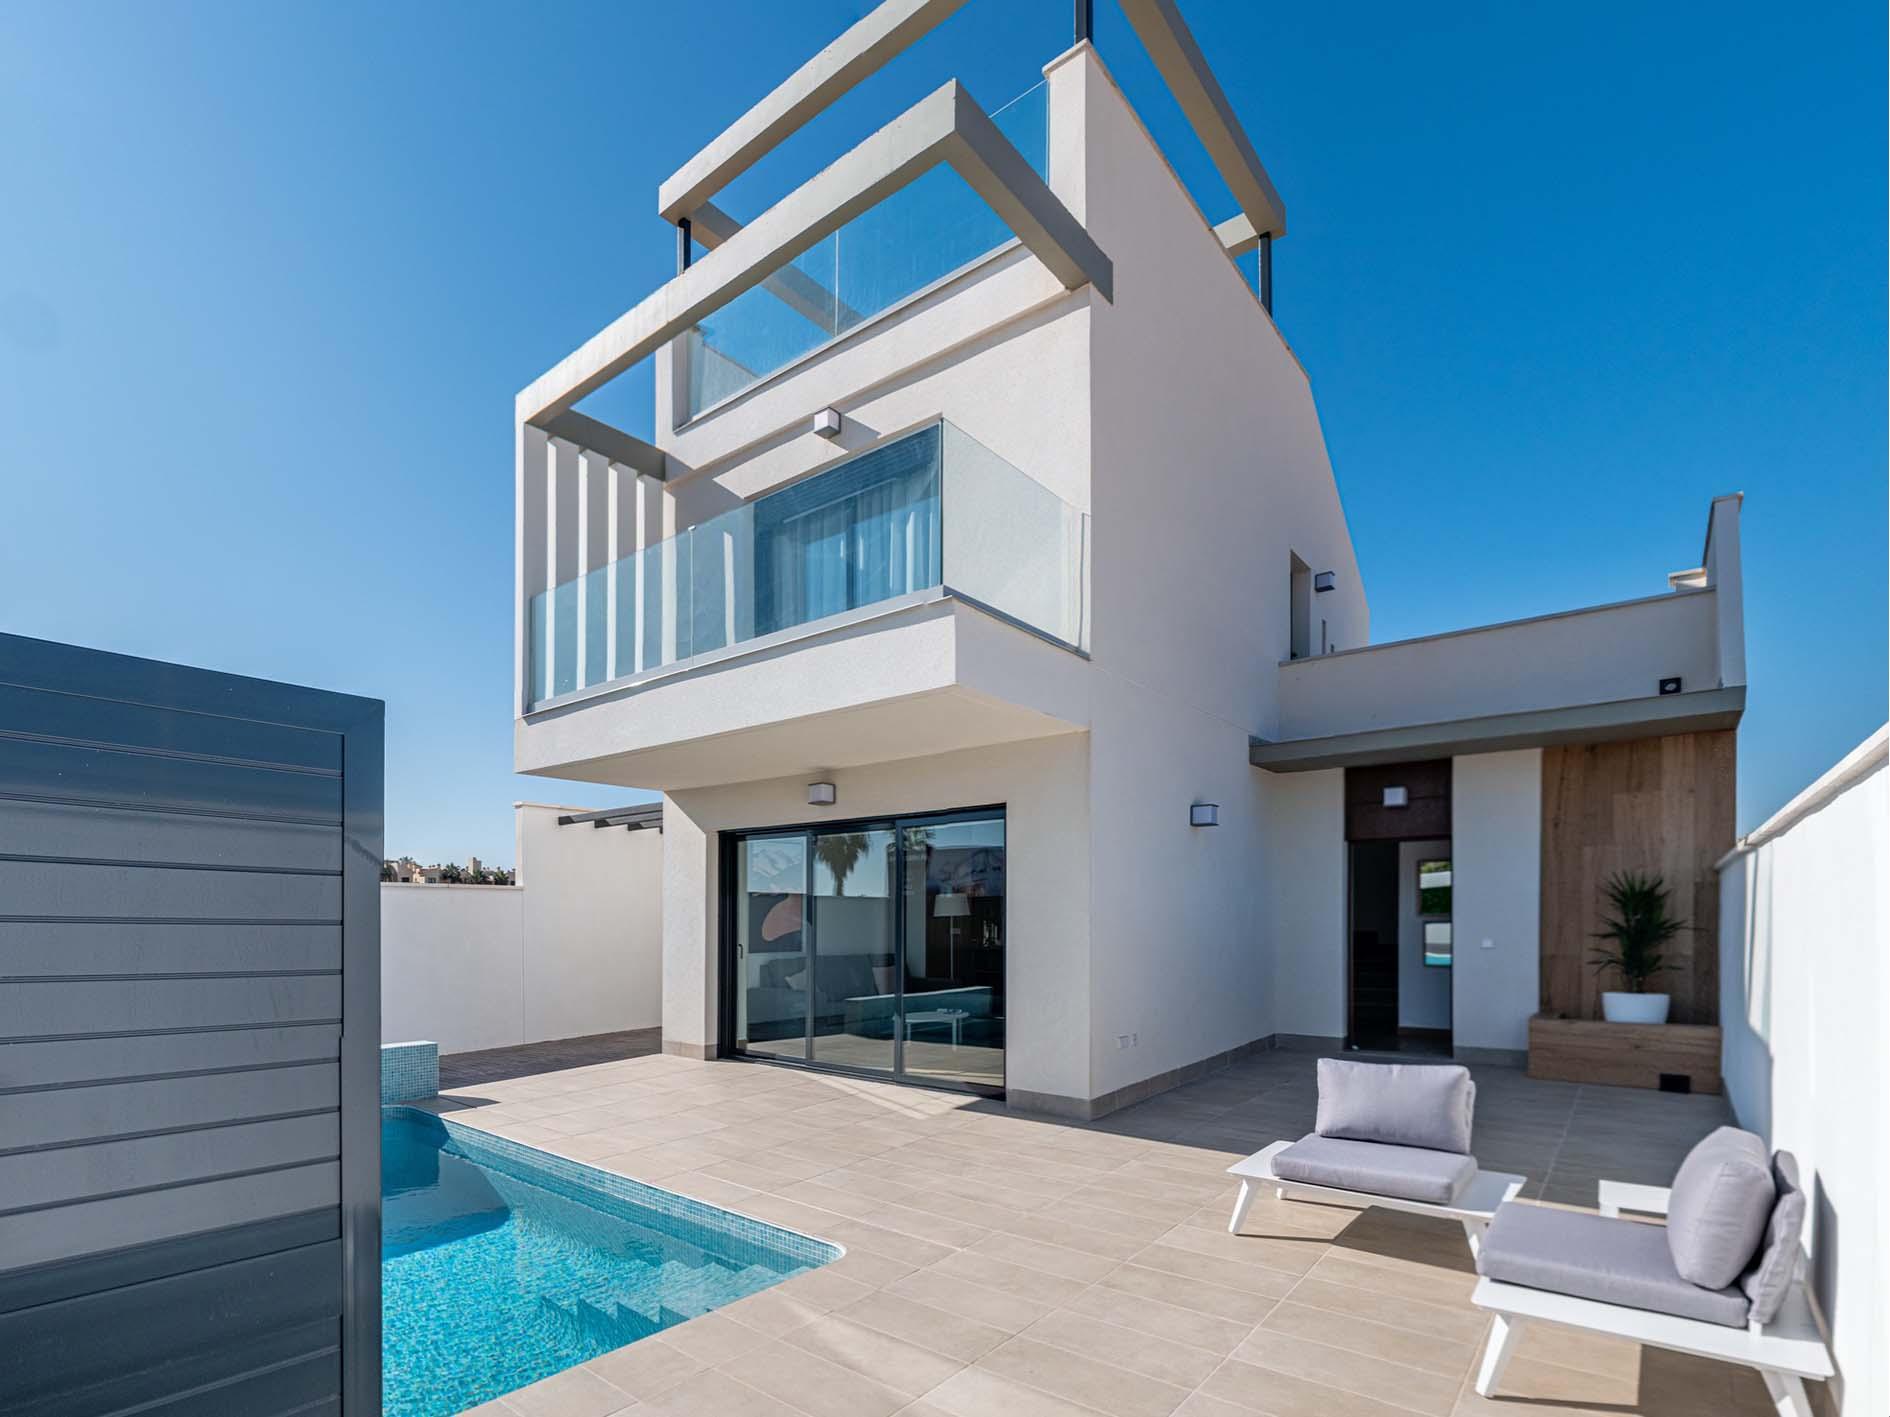 immobilier neuf espagne costa blanca on-d16 vela latina exterieur